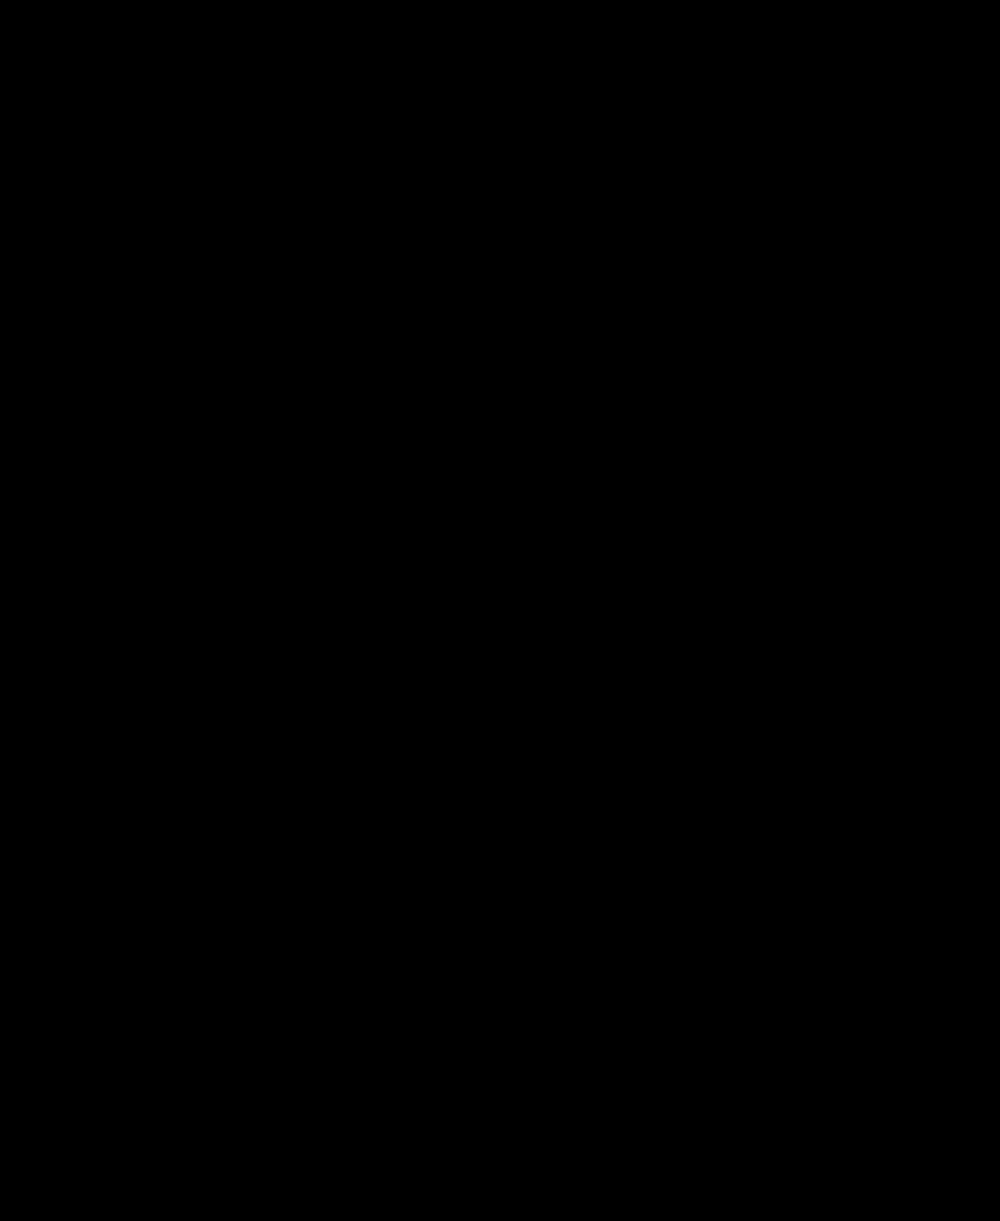 Legacy-logo-black.png